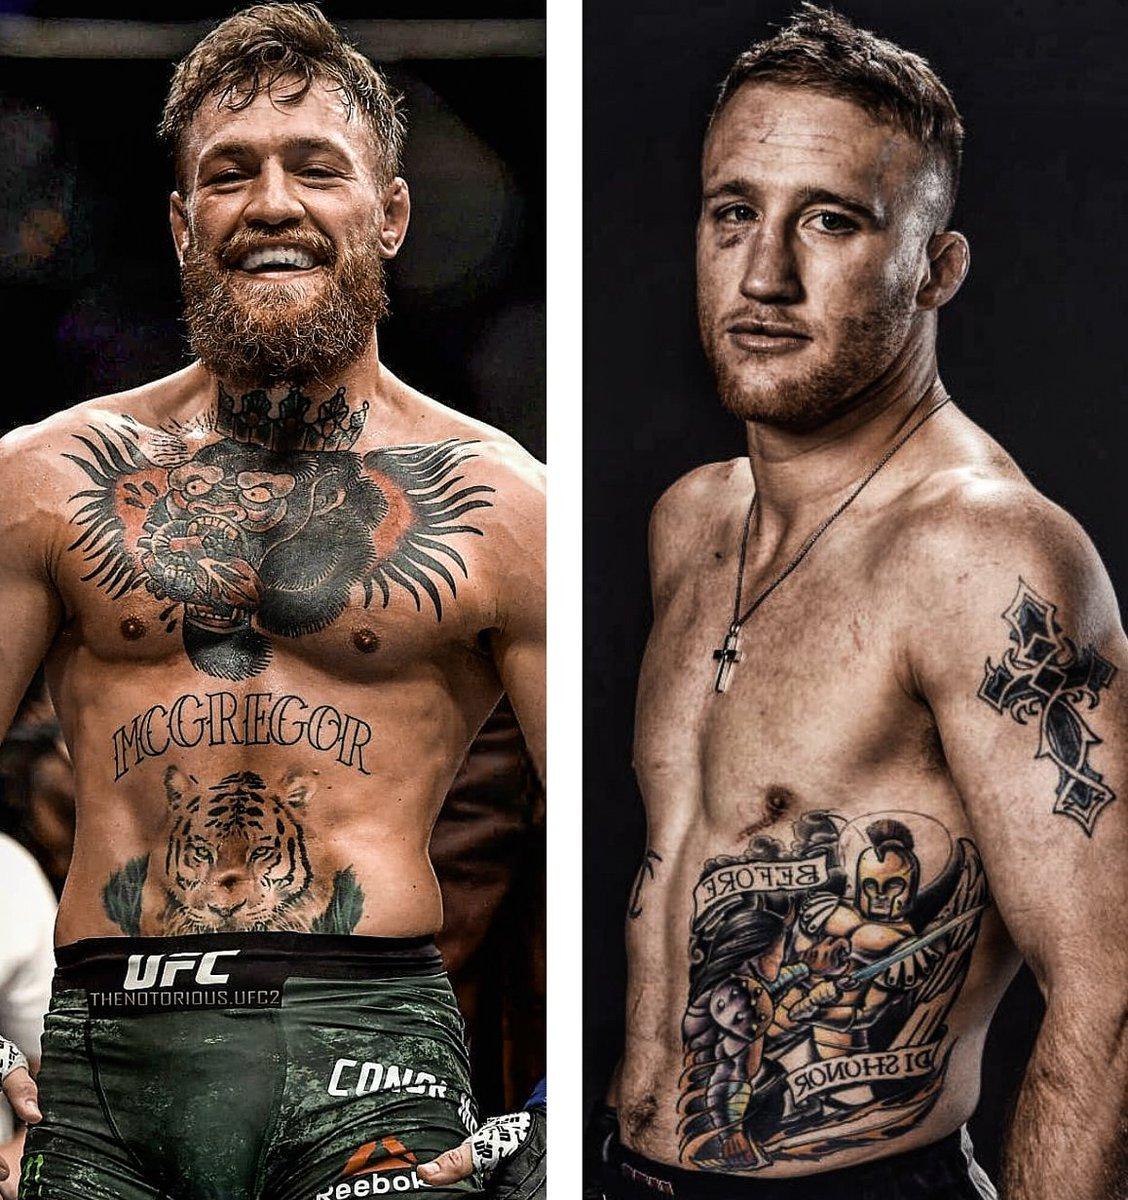 Not official yet but it looks like it's going to happen!  #UFCRochester  #MMA #UFC #MartialArts #UFConESPN #combatsports #UFC238 #UFC239 #UFC240  #ConorMcGregor #JustinGaethje